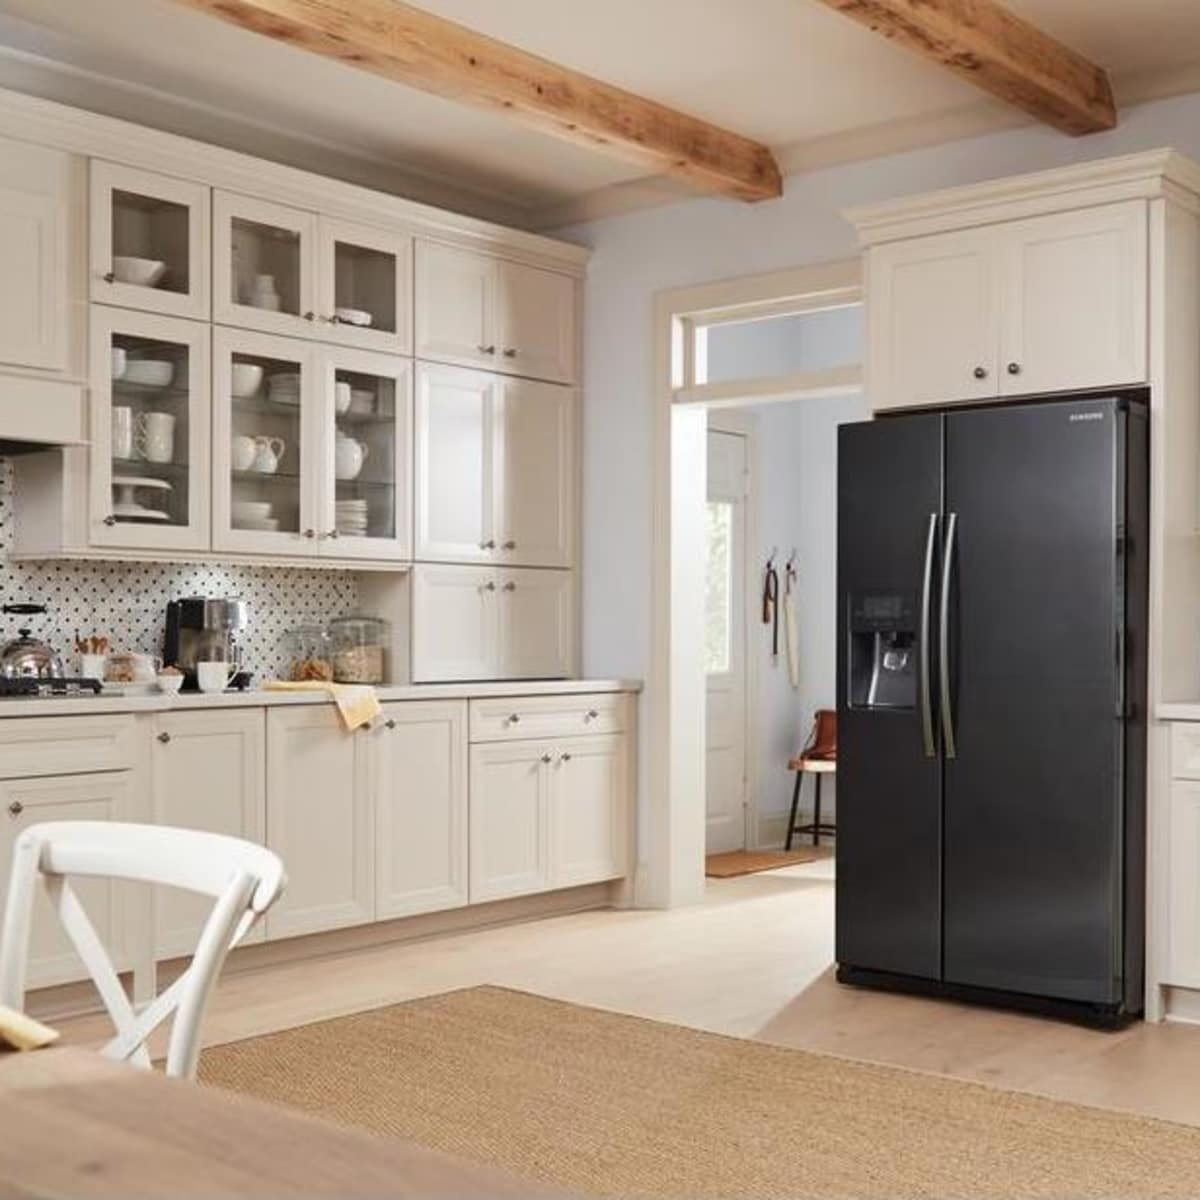 Samsung RS25J500DSG side-by-side refrigerator - Reviewed